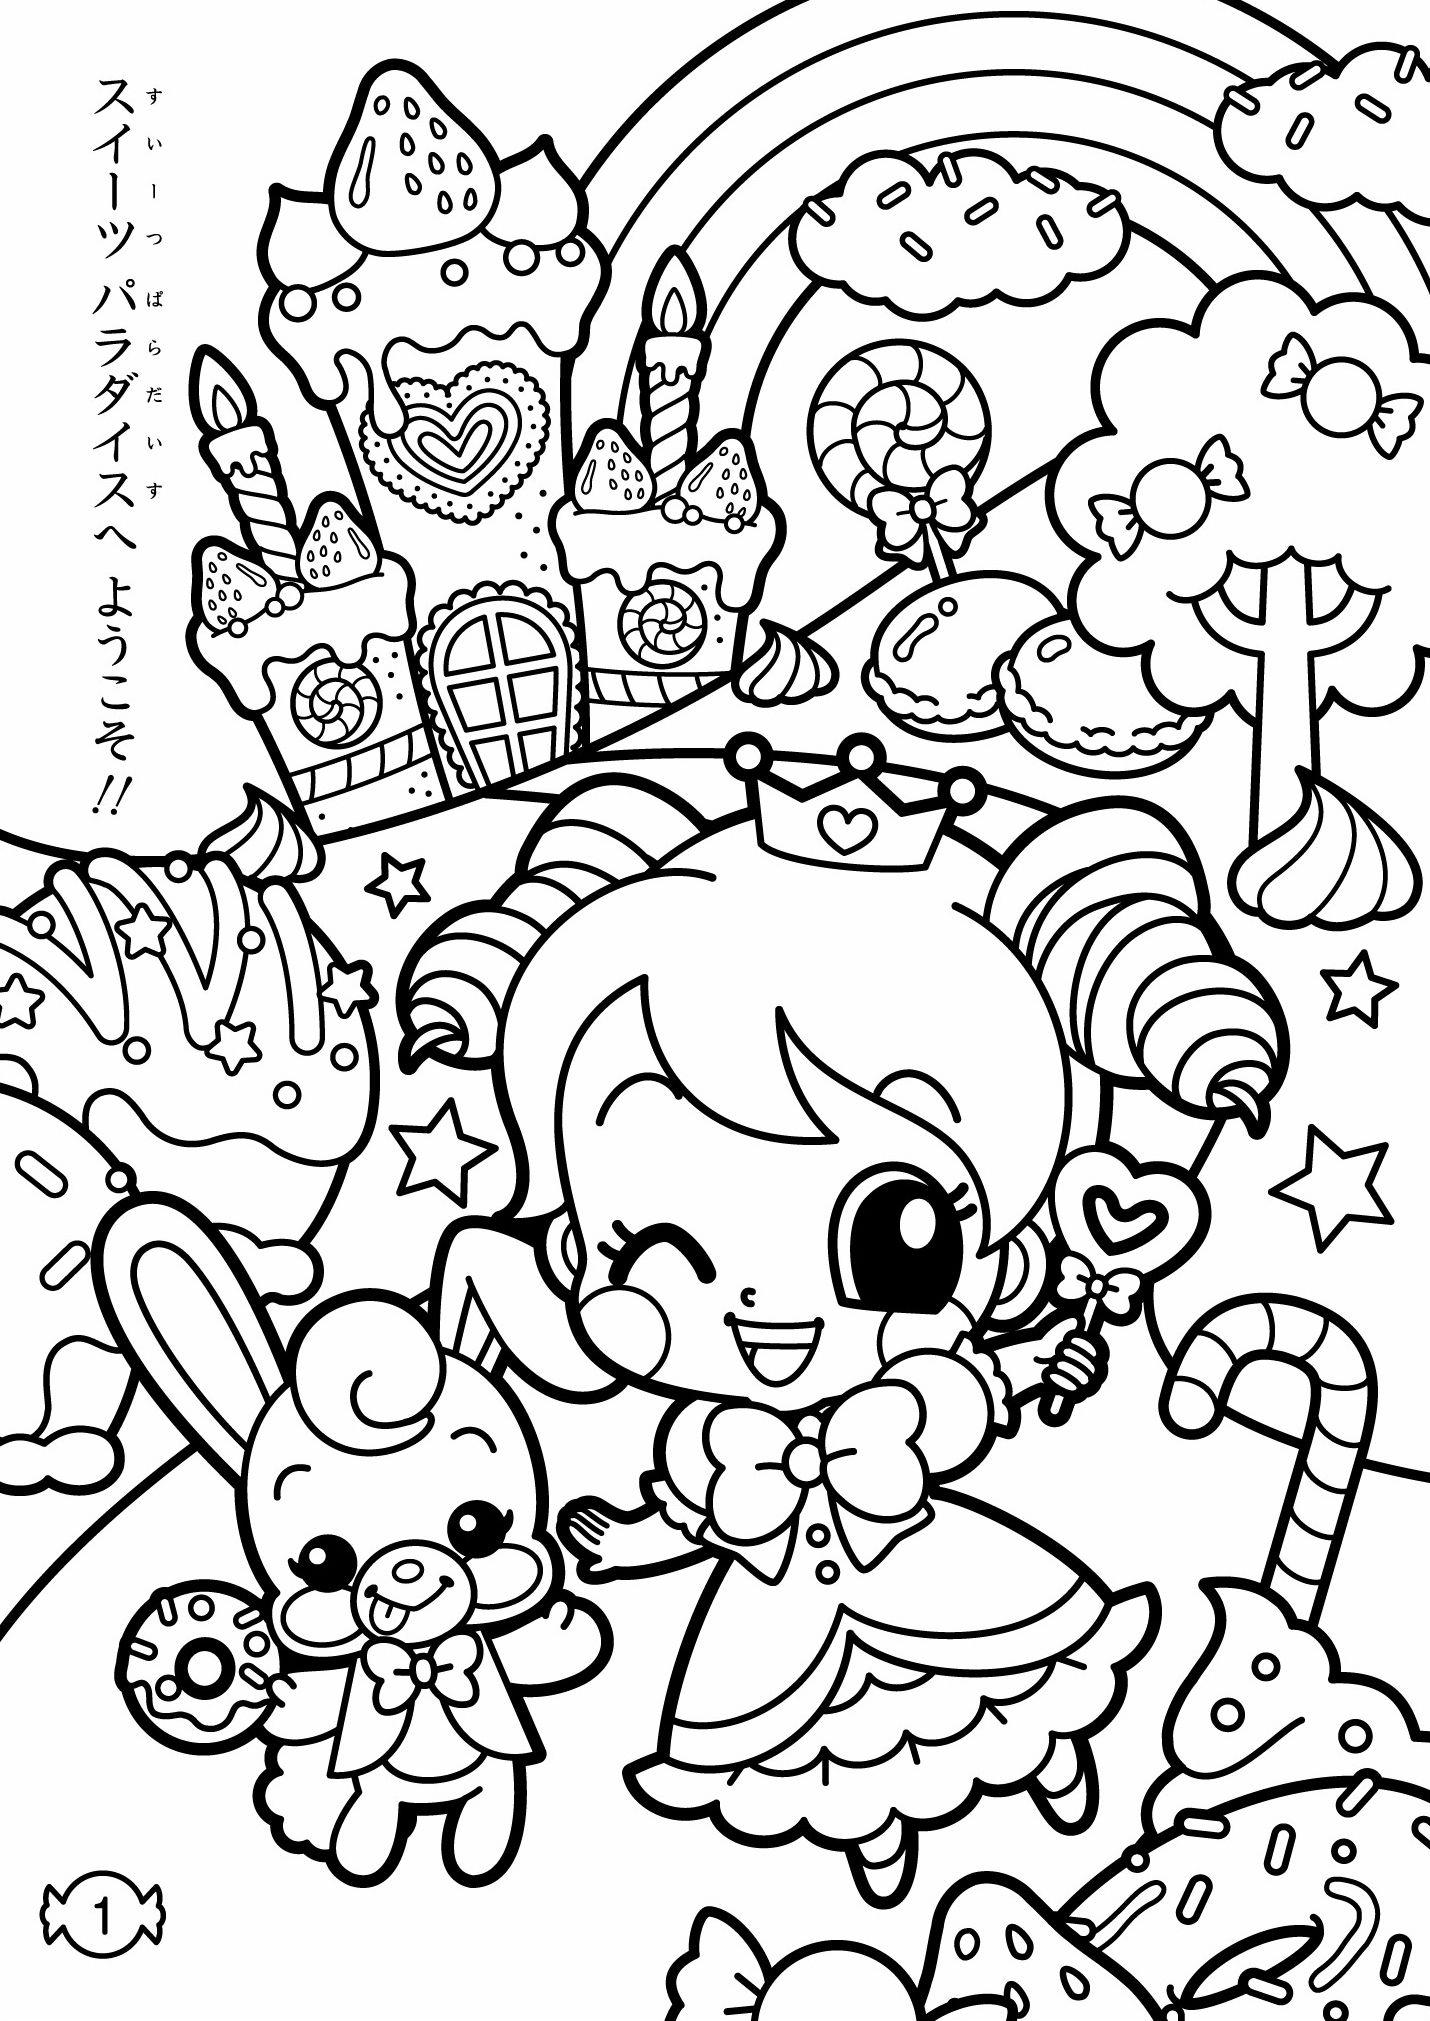 1430x2021 Kawaii Kids Coloring Pages Kawaii, Adult Coloring